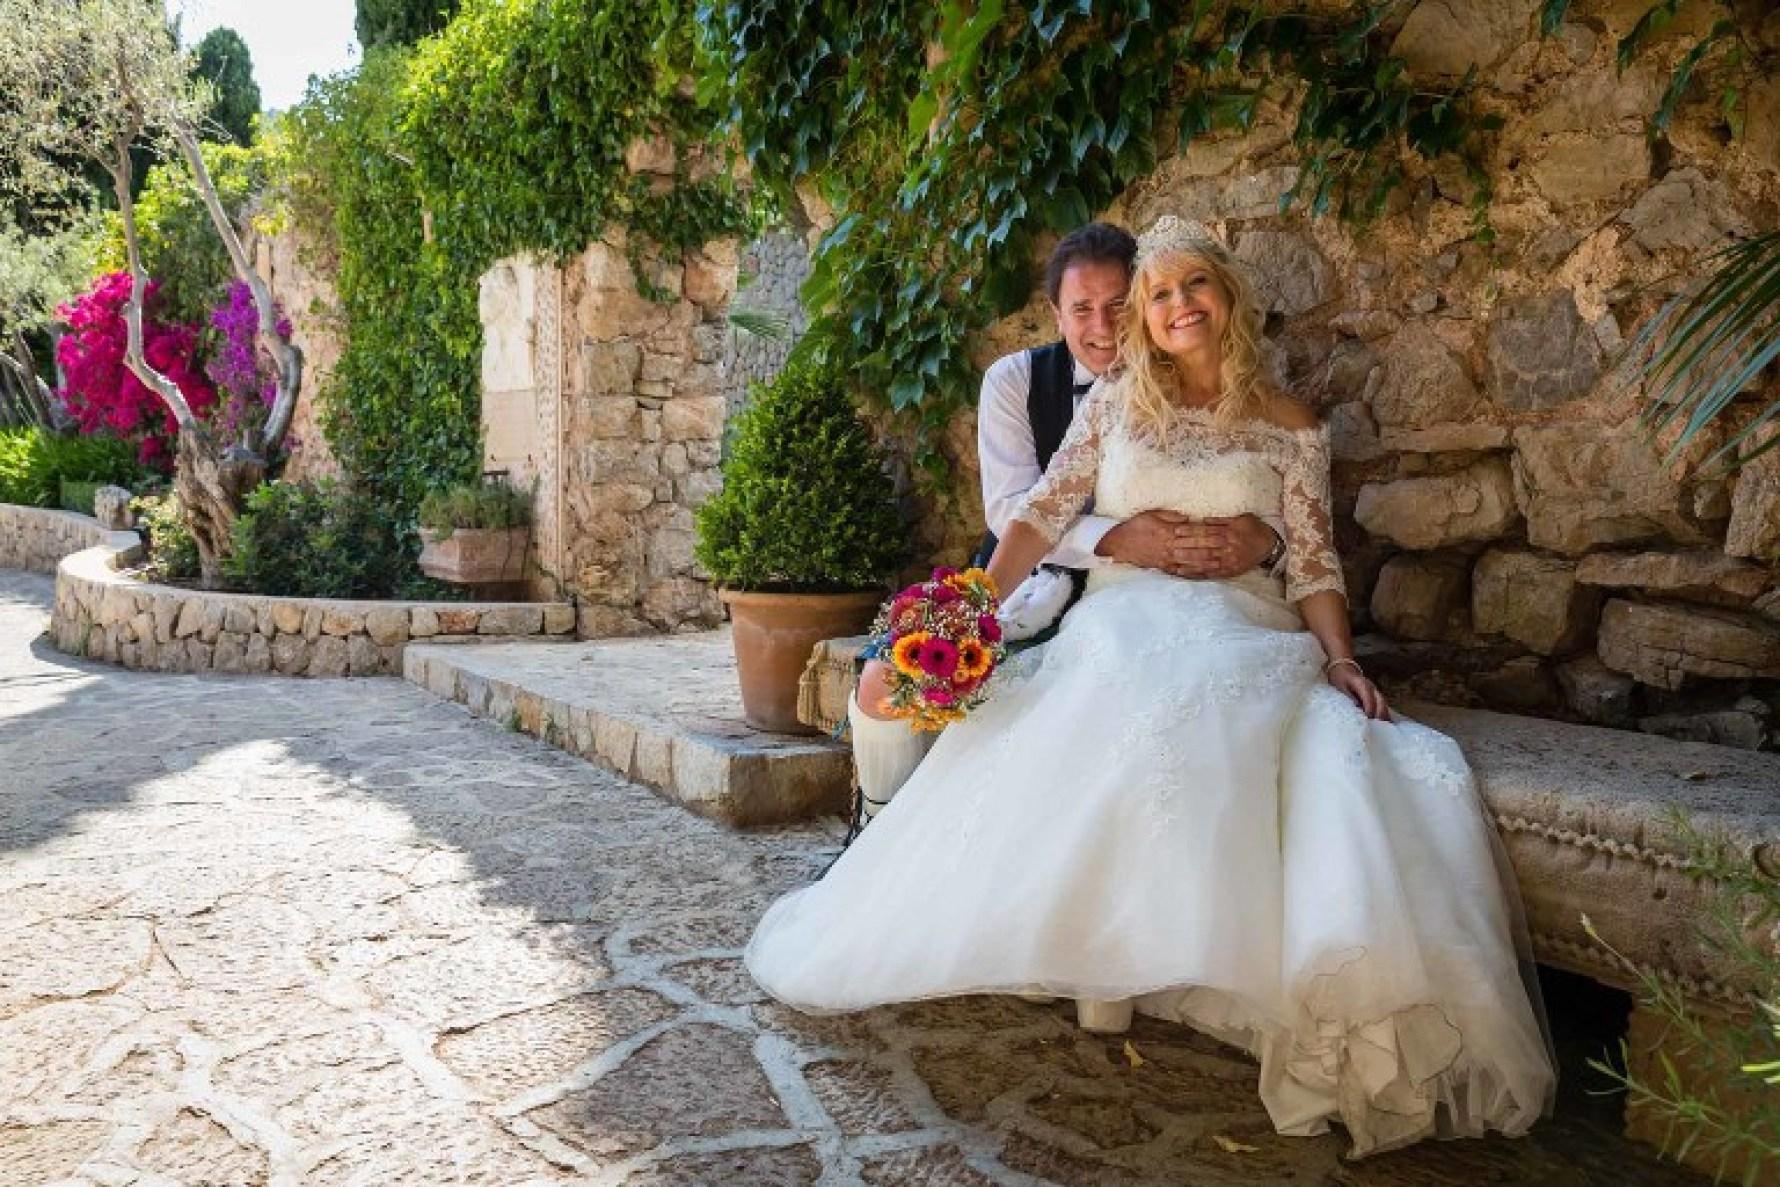 A fun Mallorca wedding in beautiful Valldemossa by Mallorca wedding photographer Graham Warrellow